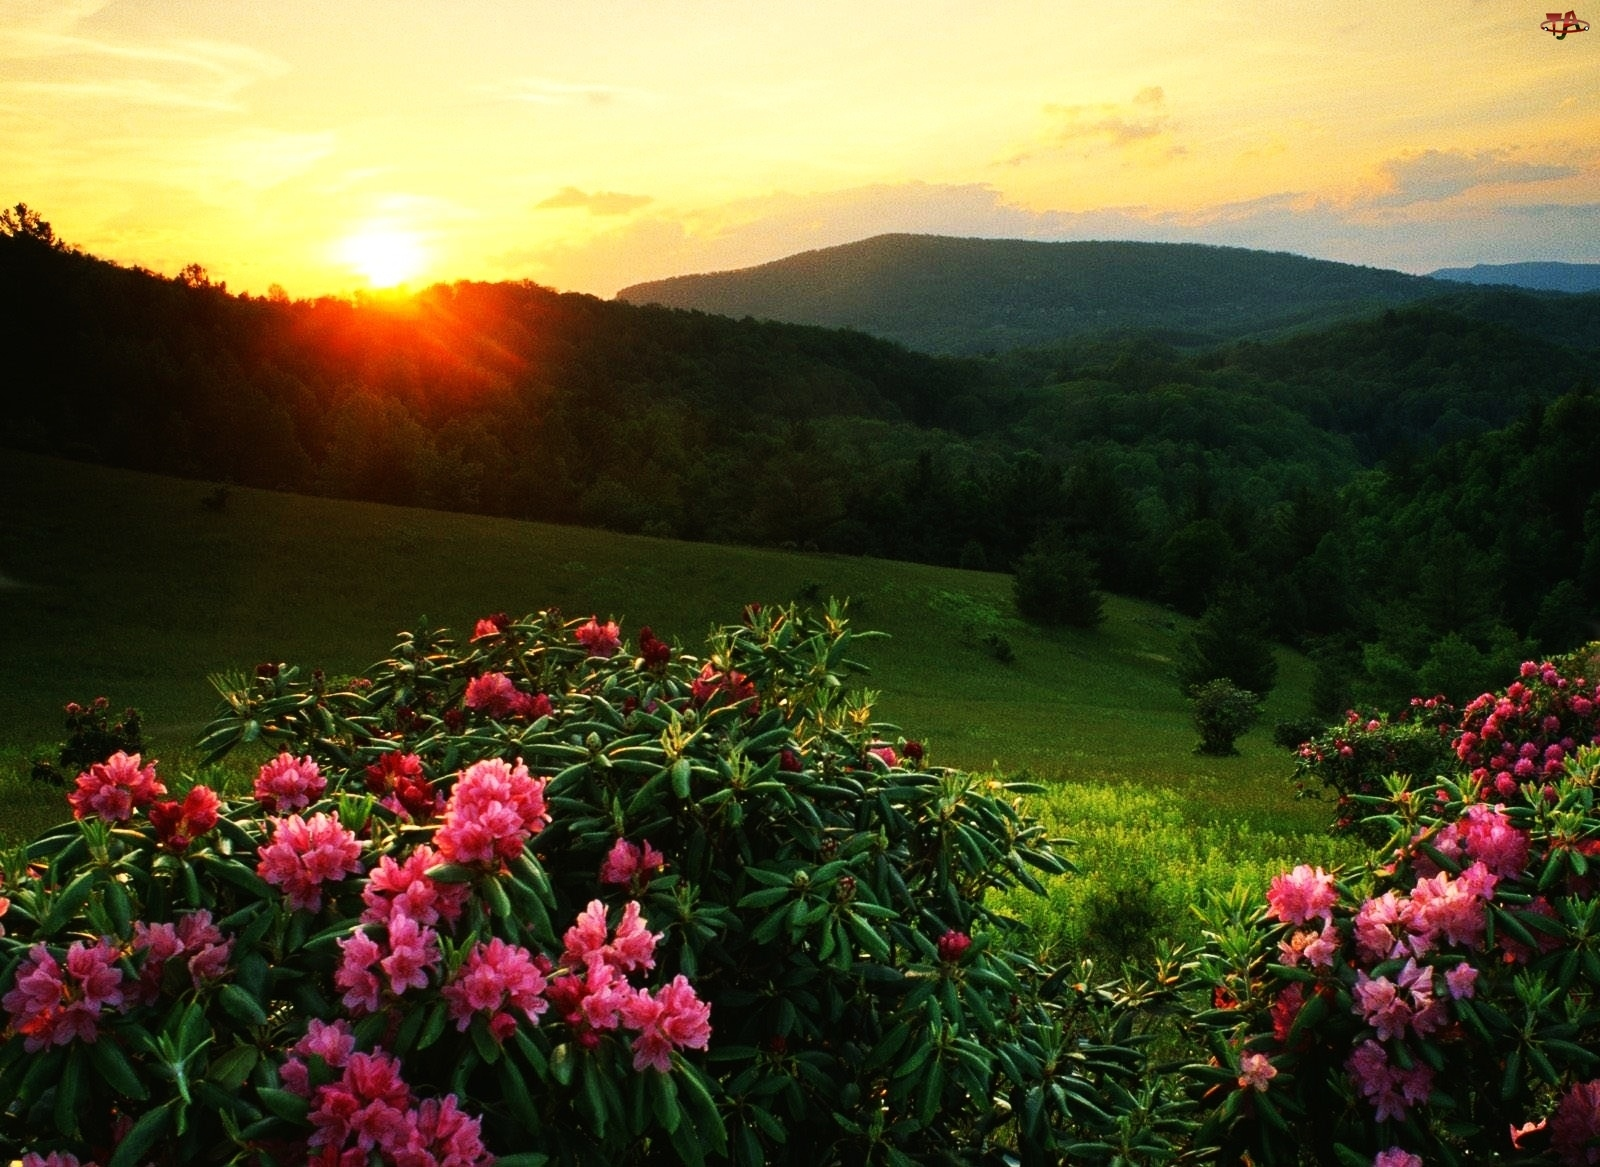 Zachód, Rododendrony, Słońca, Wzgórza